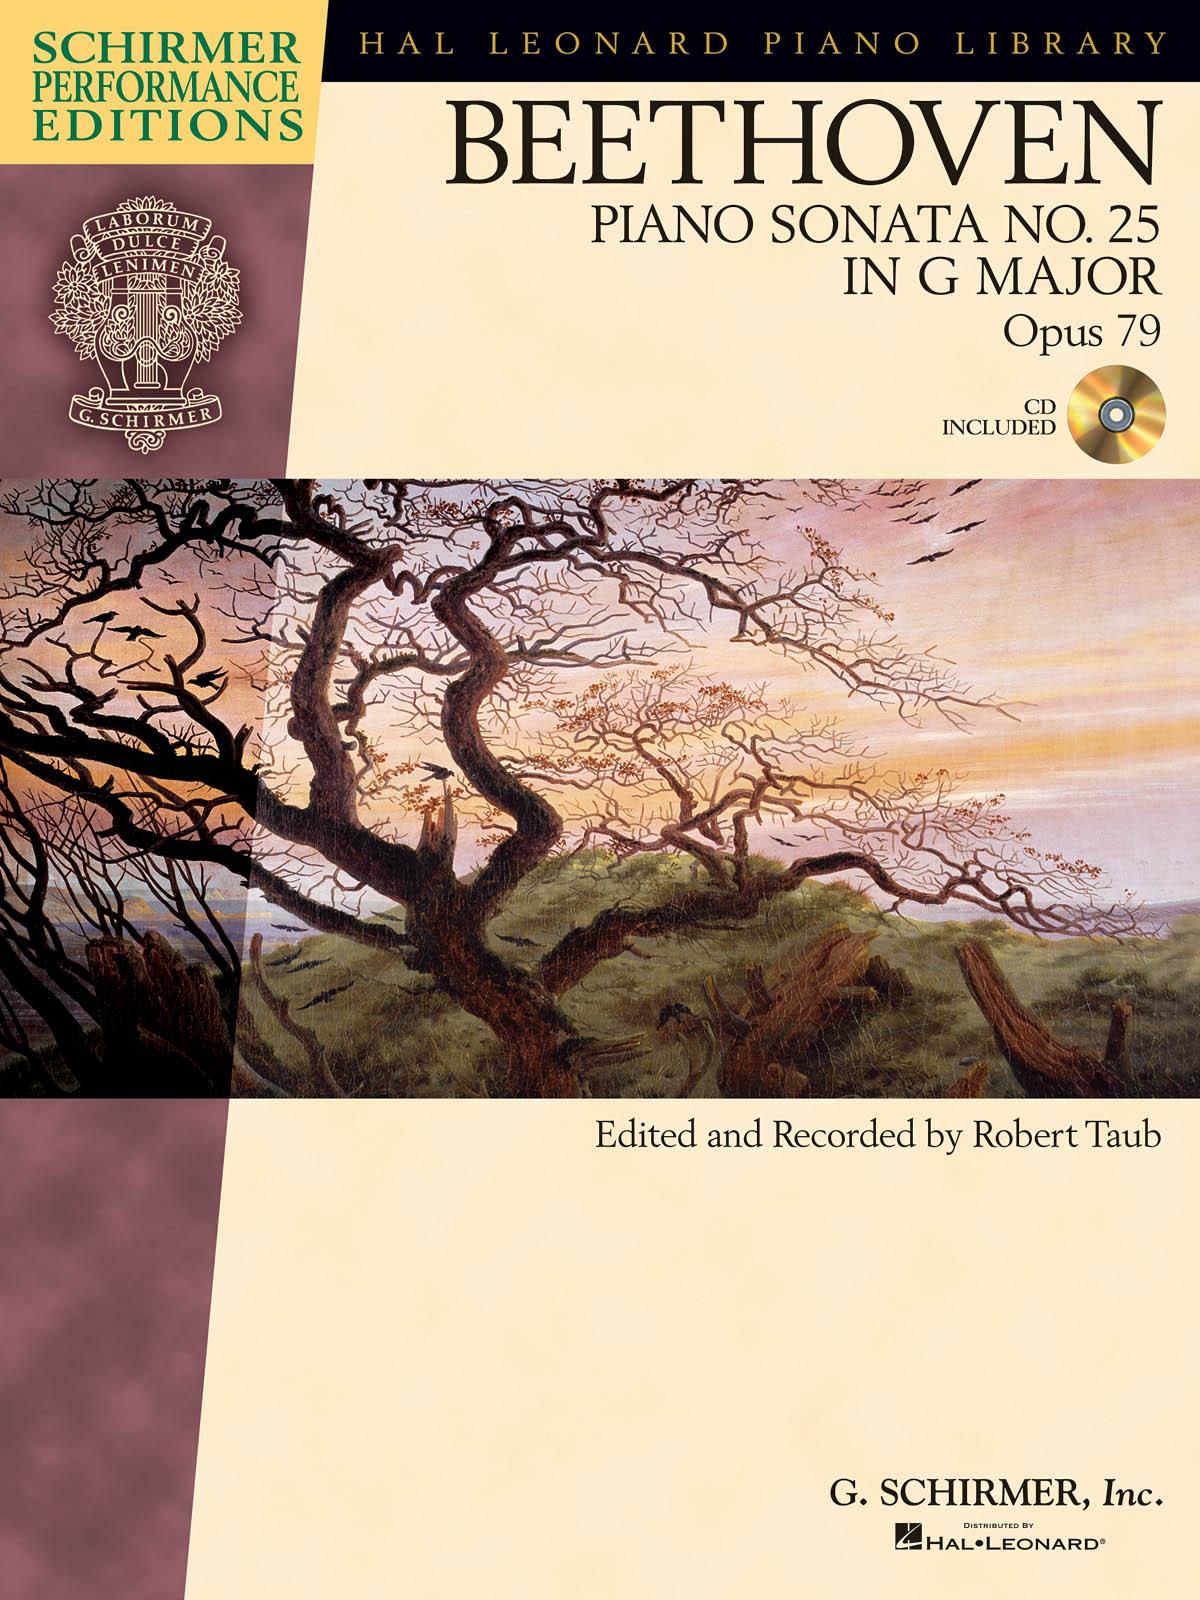 Ludwig Van Beethoven: Piano Sonata No.25 In G Op.79 (Schirmer Performance Edition) (Schirmer Performance Editions)